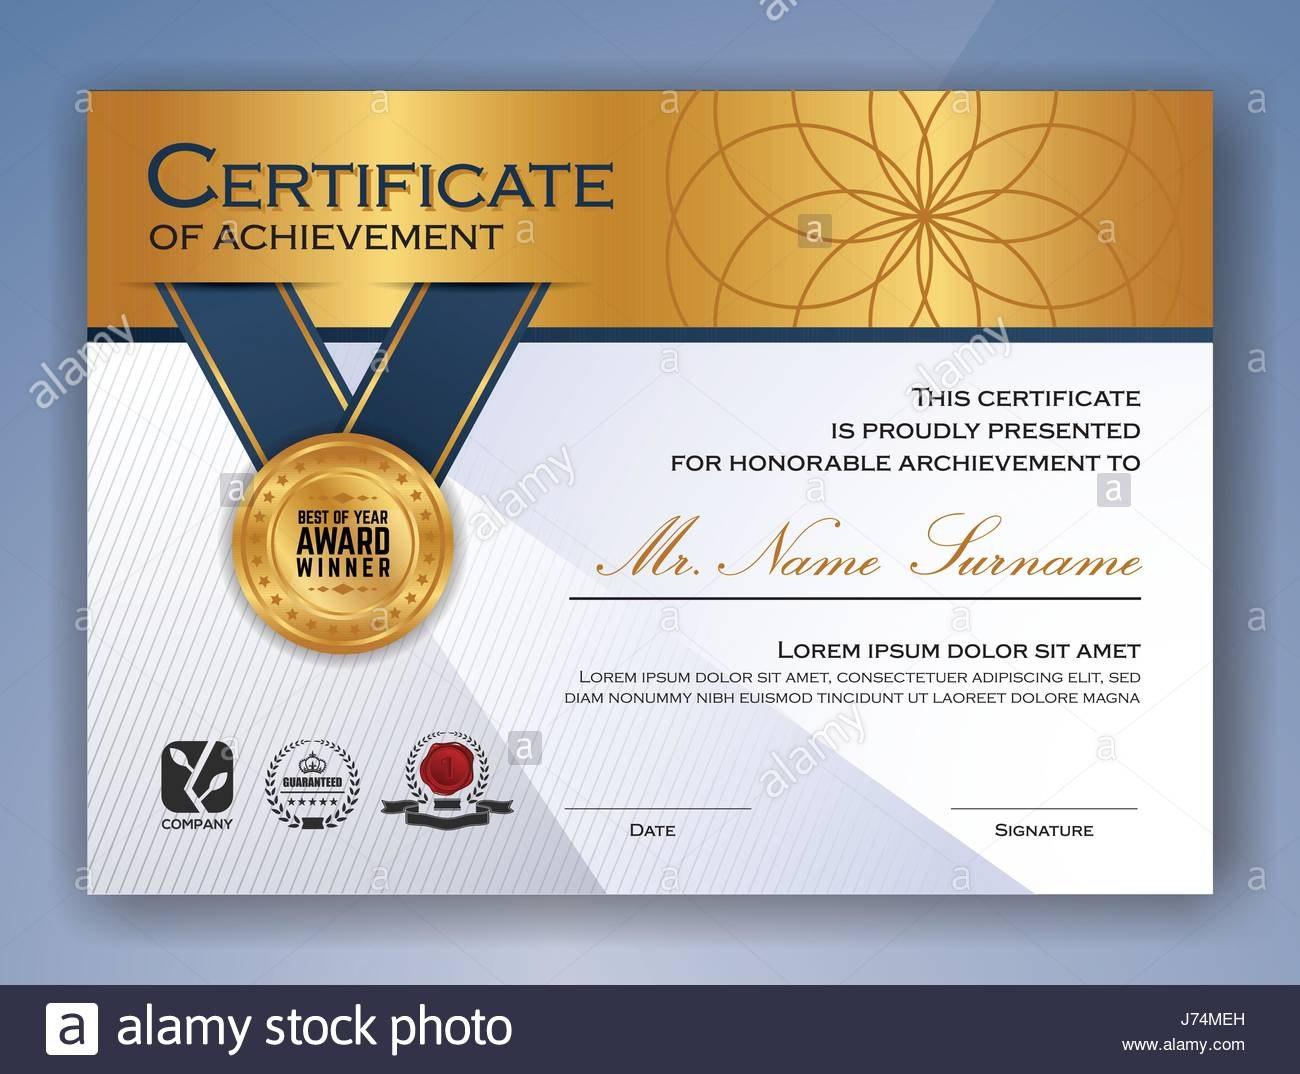 Multipurpose Professional Certificate Template Design For Print For Design A Certificate Template